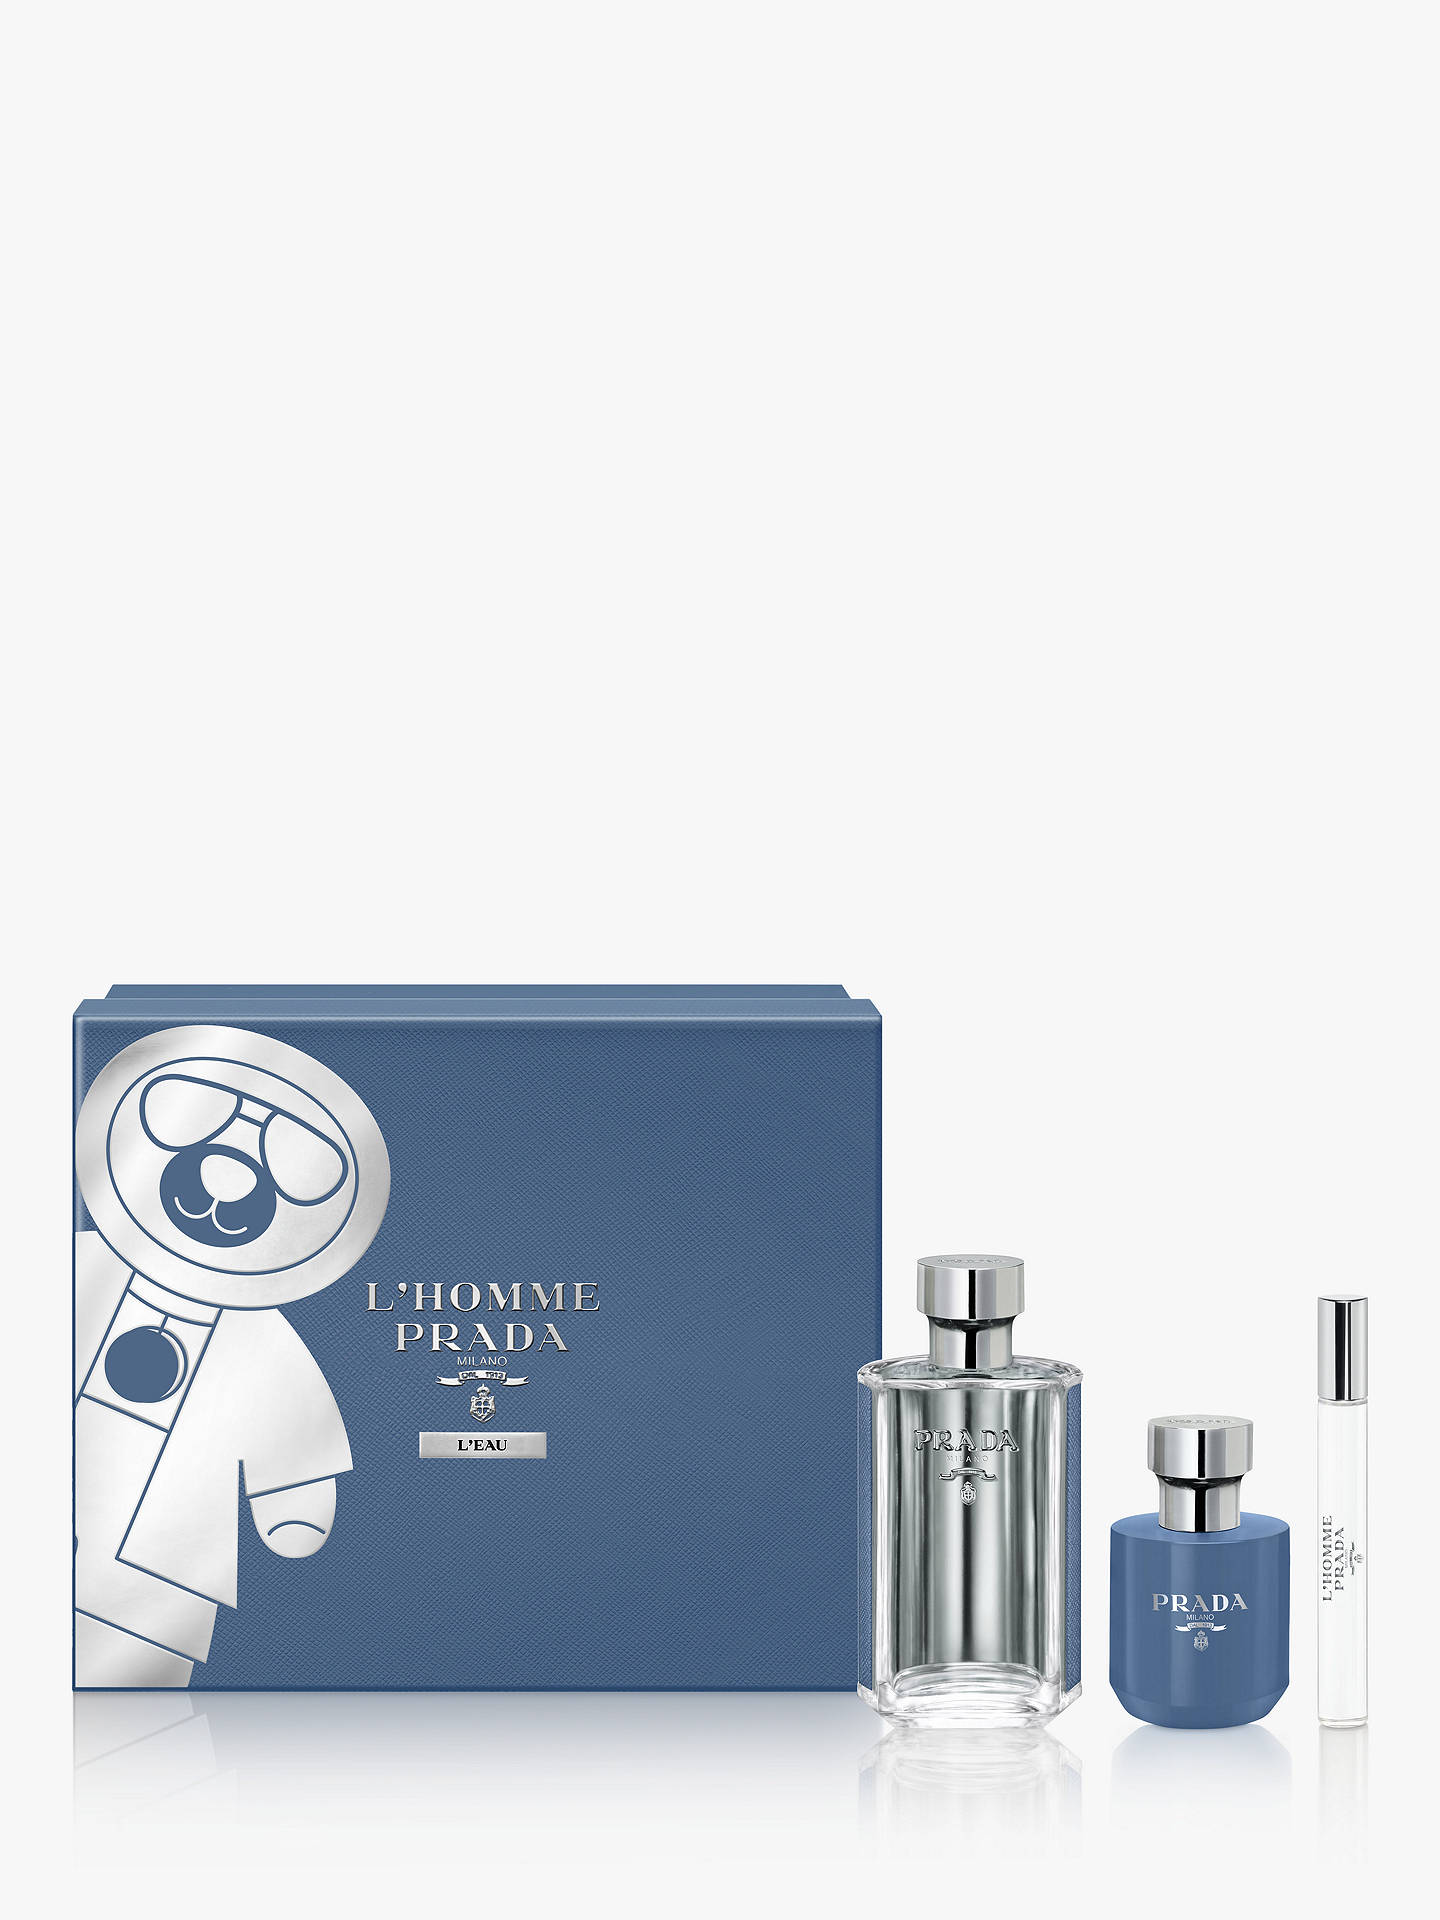 4e25bf8445 Prada L'Homme L'Eau 100ml Eau de Toilette Fragrance Gift Set at John ...